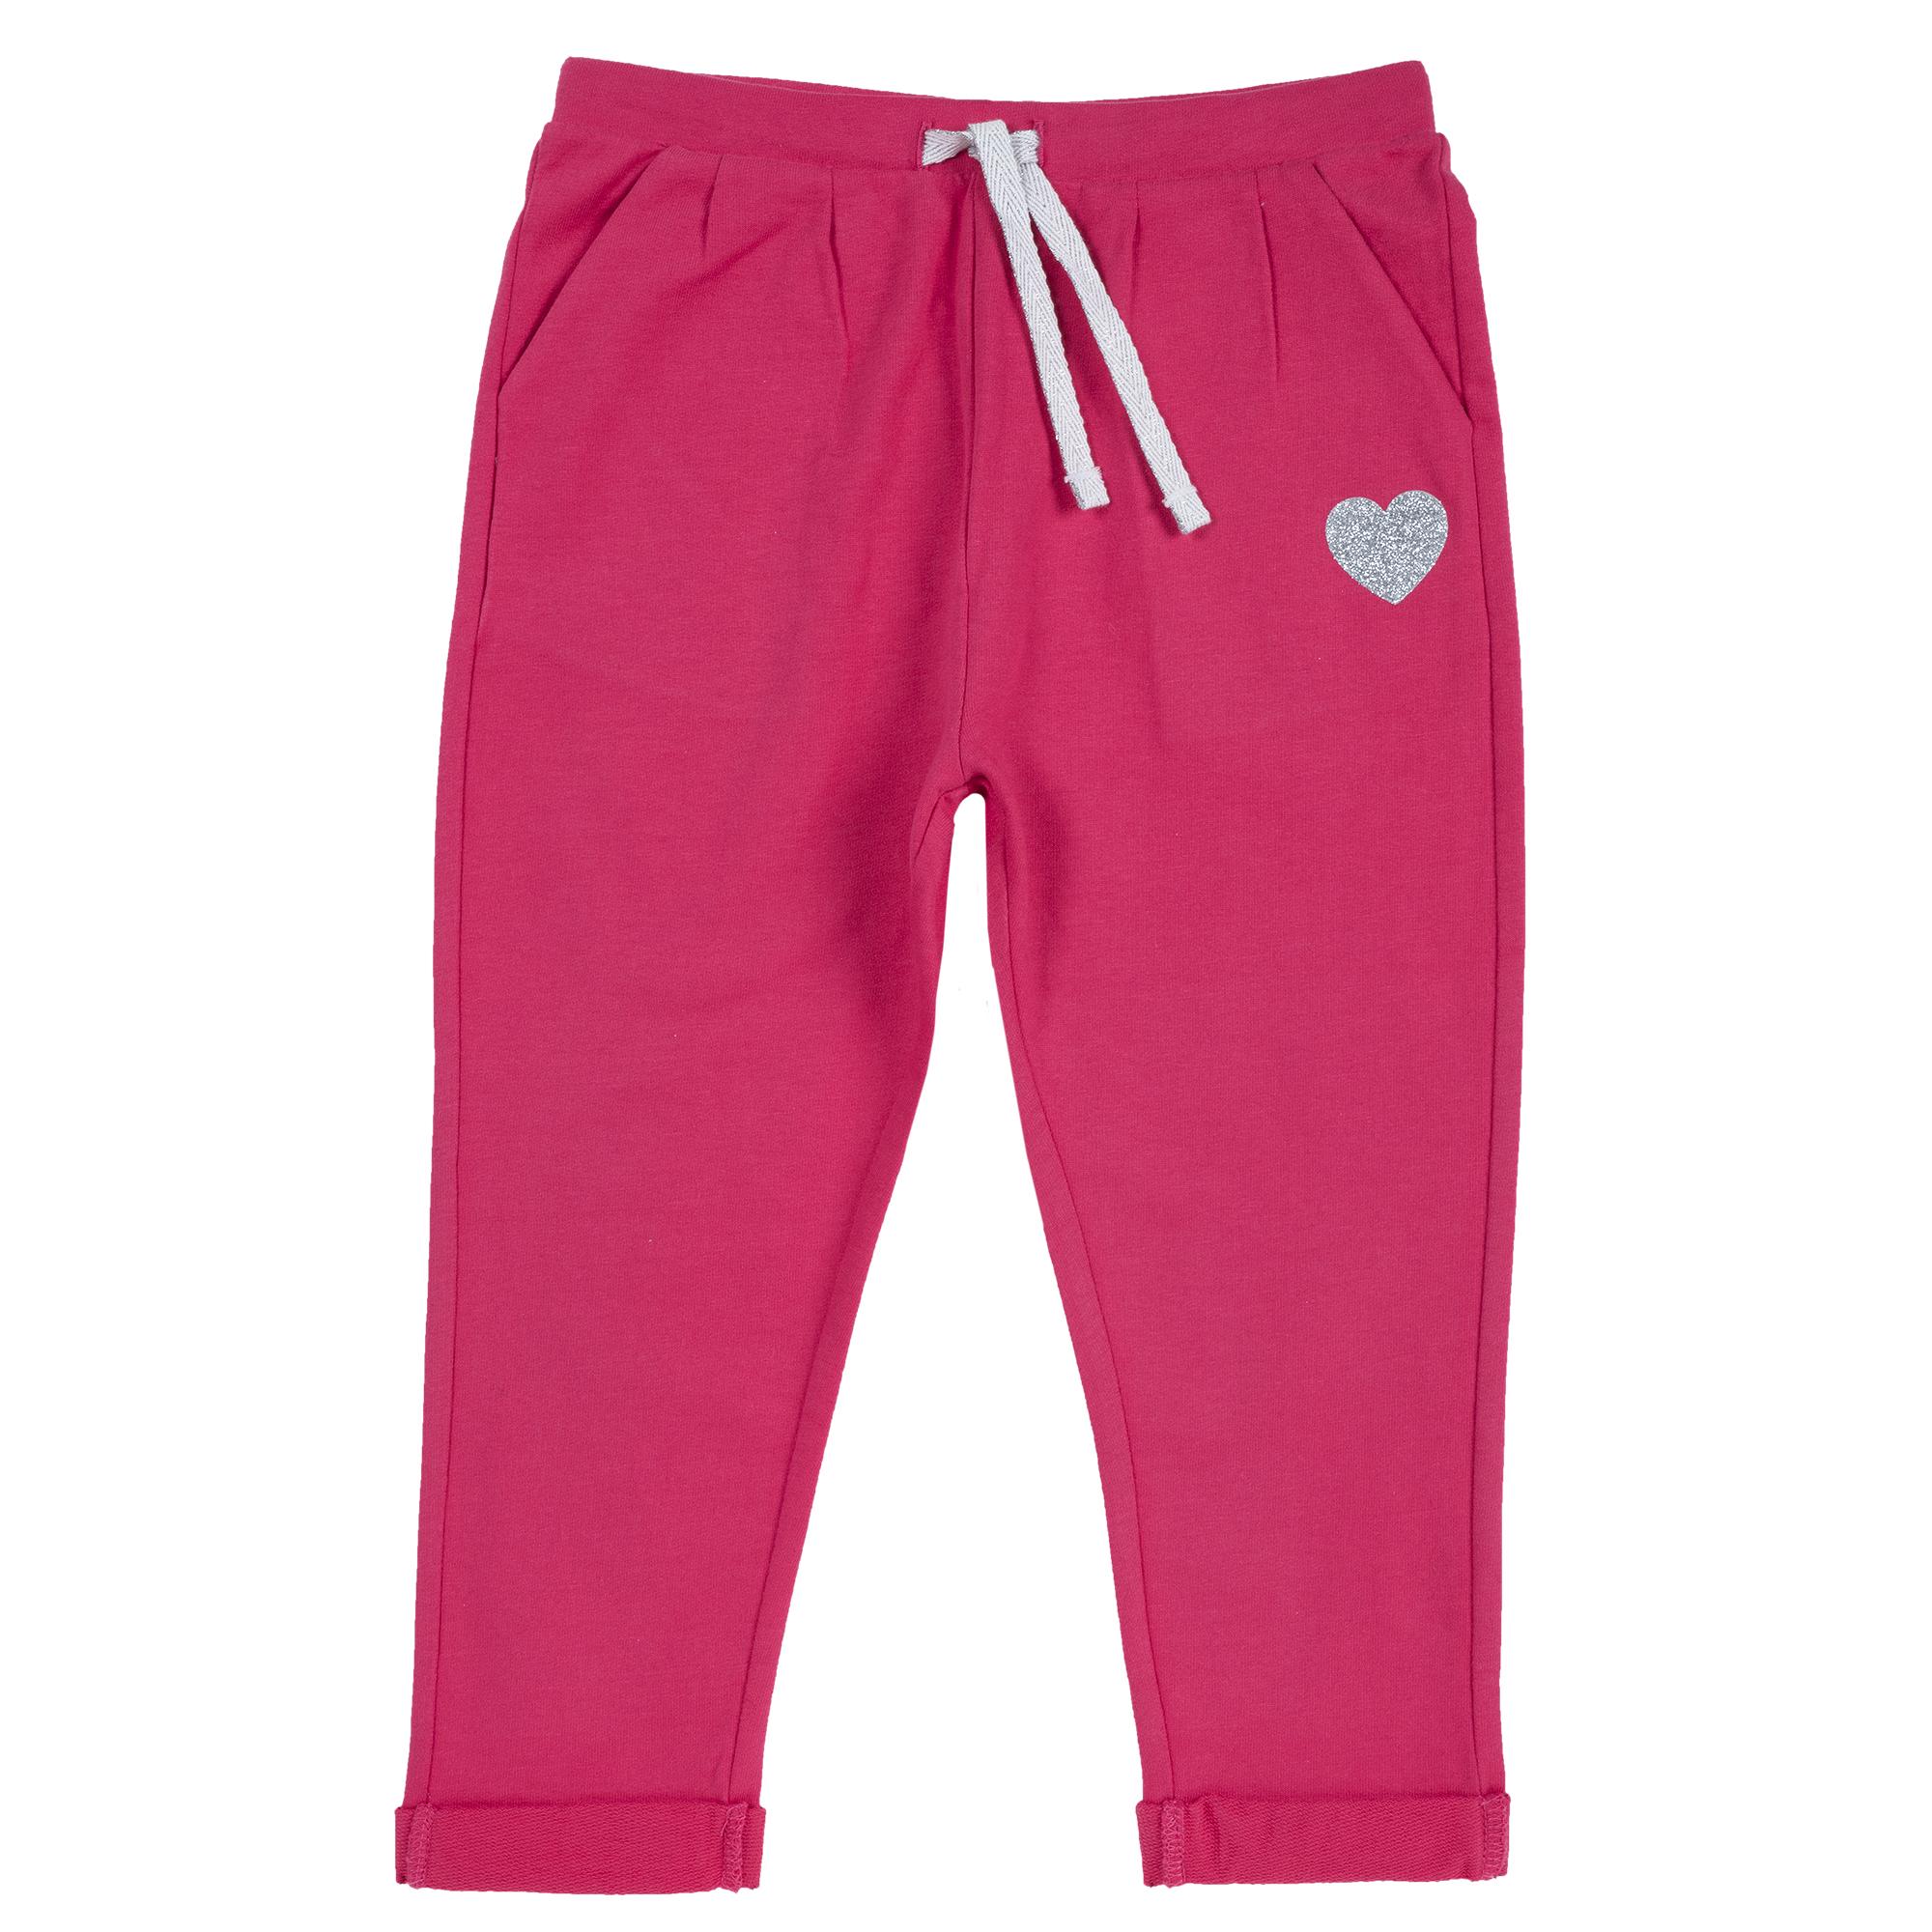 Chicco Pantalon trening copii Chicco roz 128